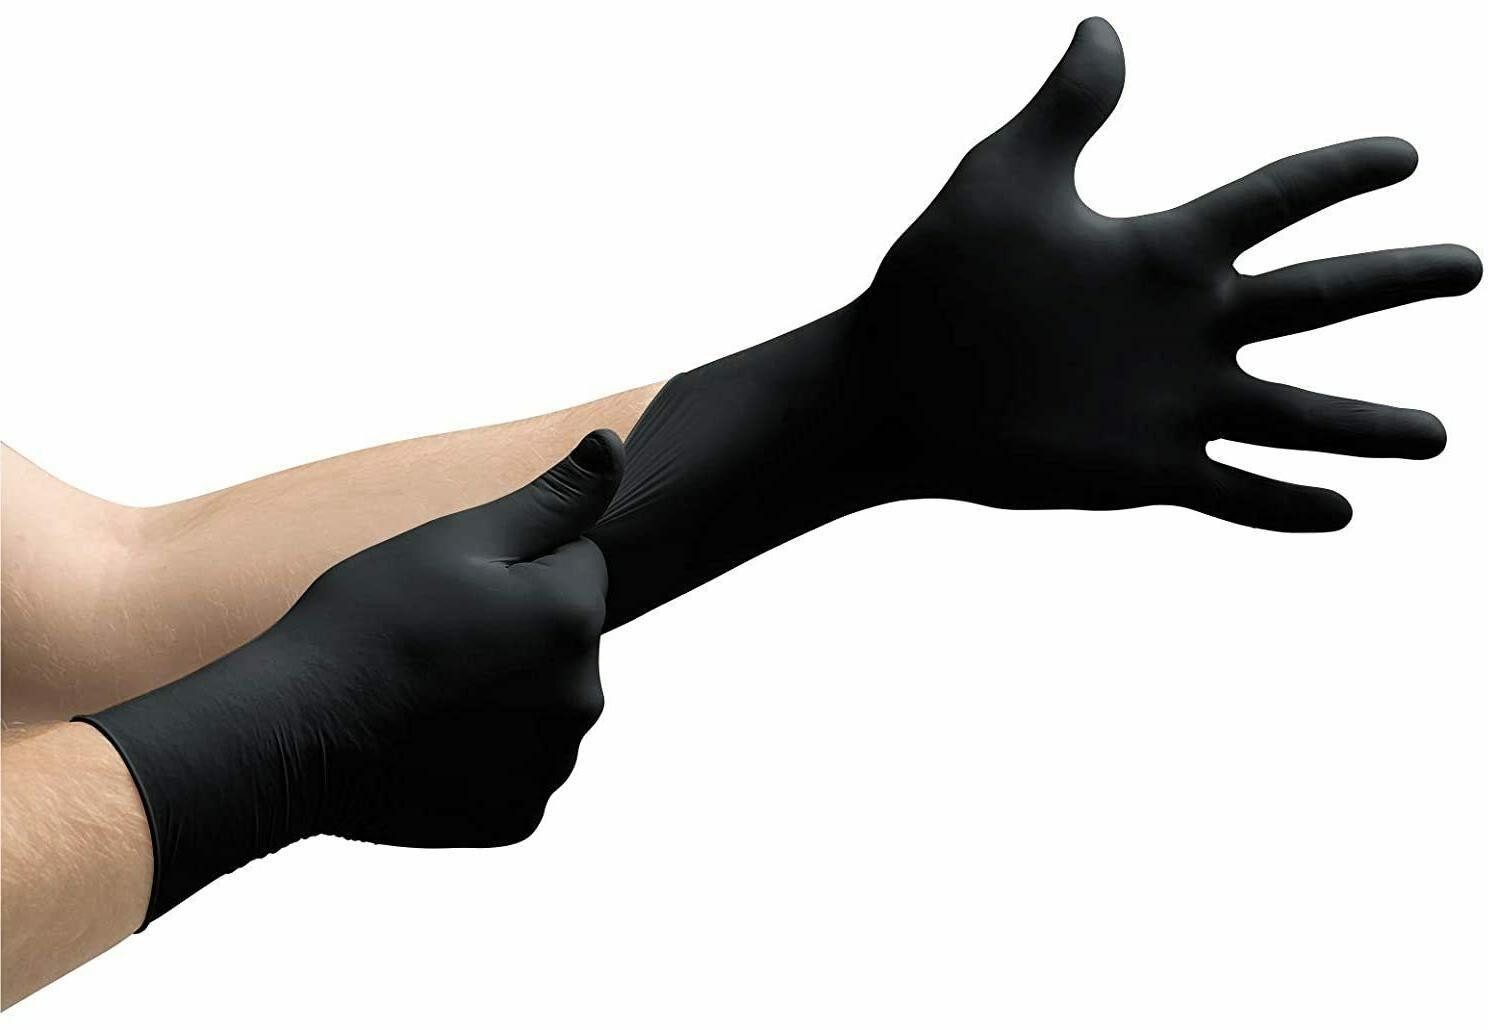 تصویر دستکش پزشکی نیتریل مشکی مای کلاو مالزی سایز مدیوم